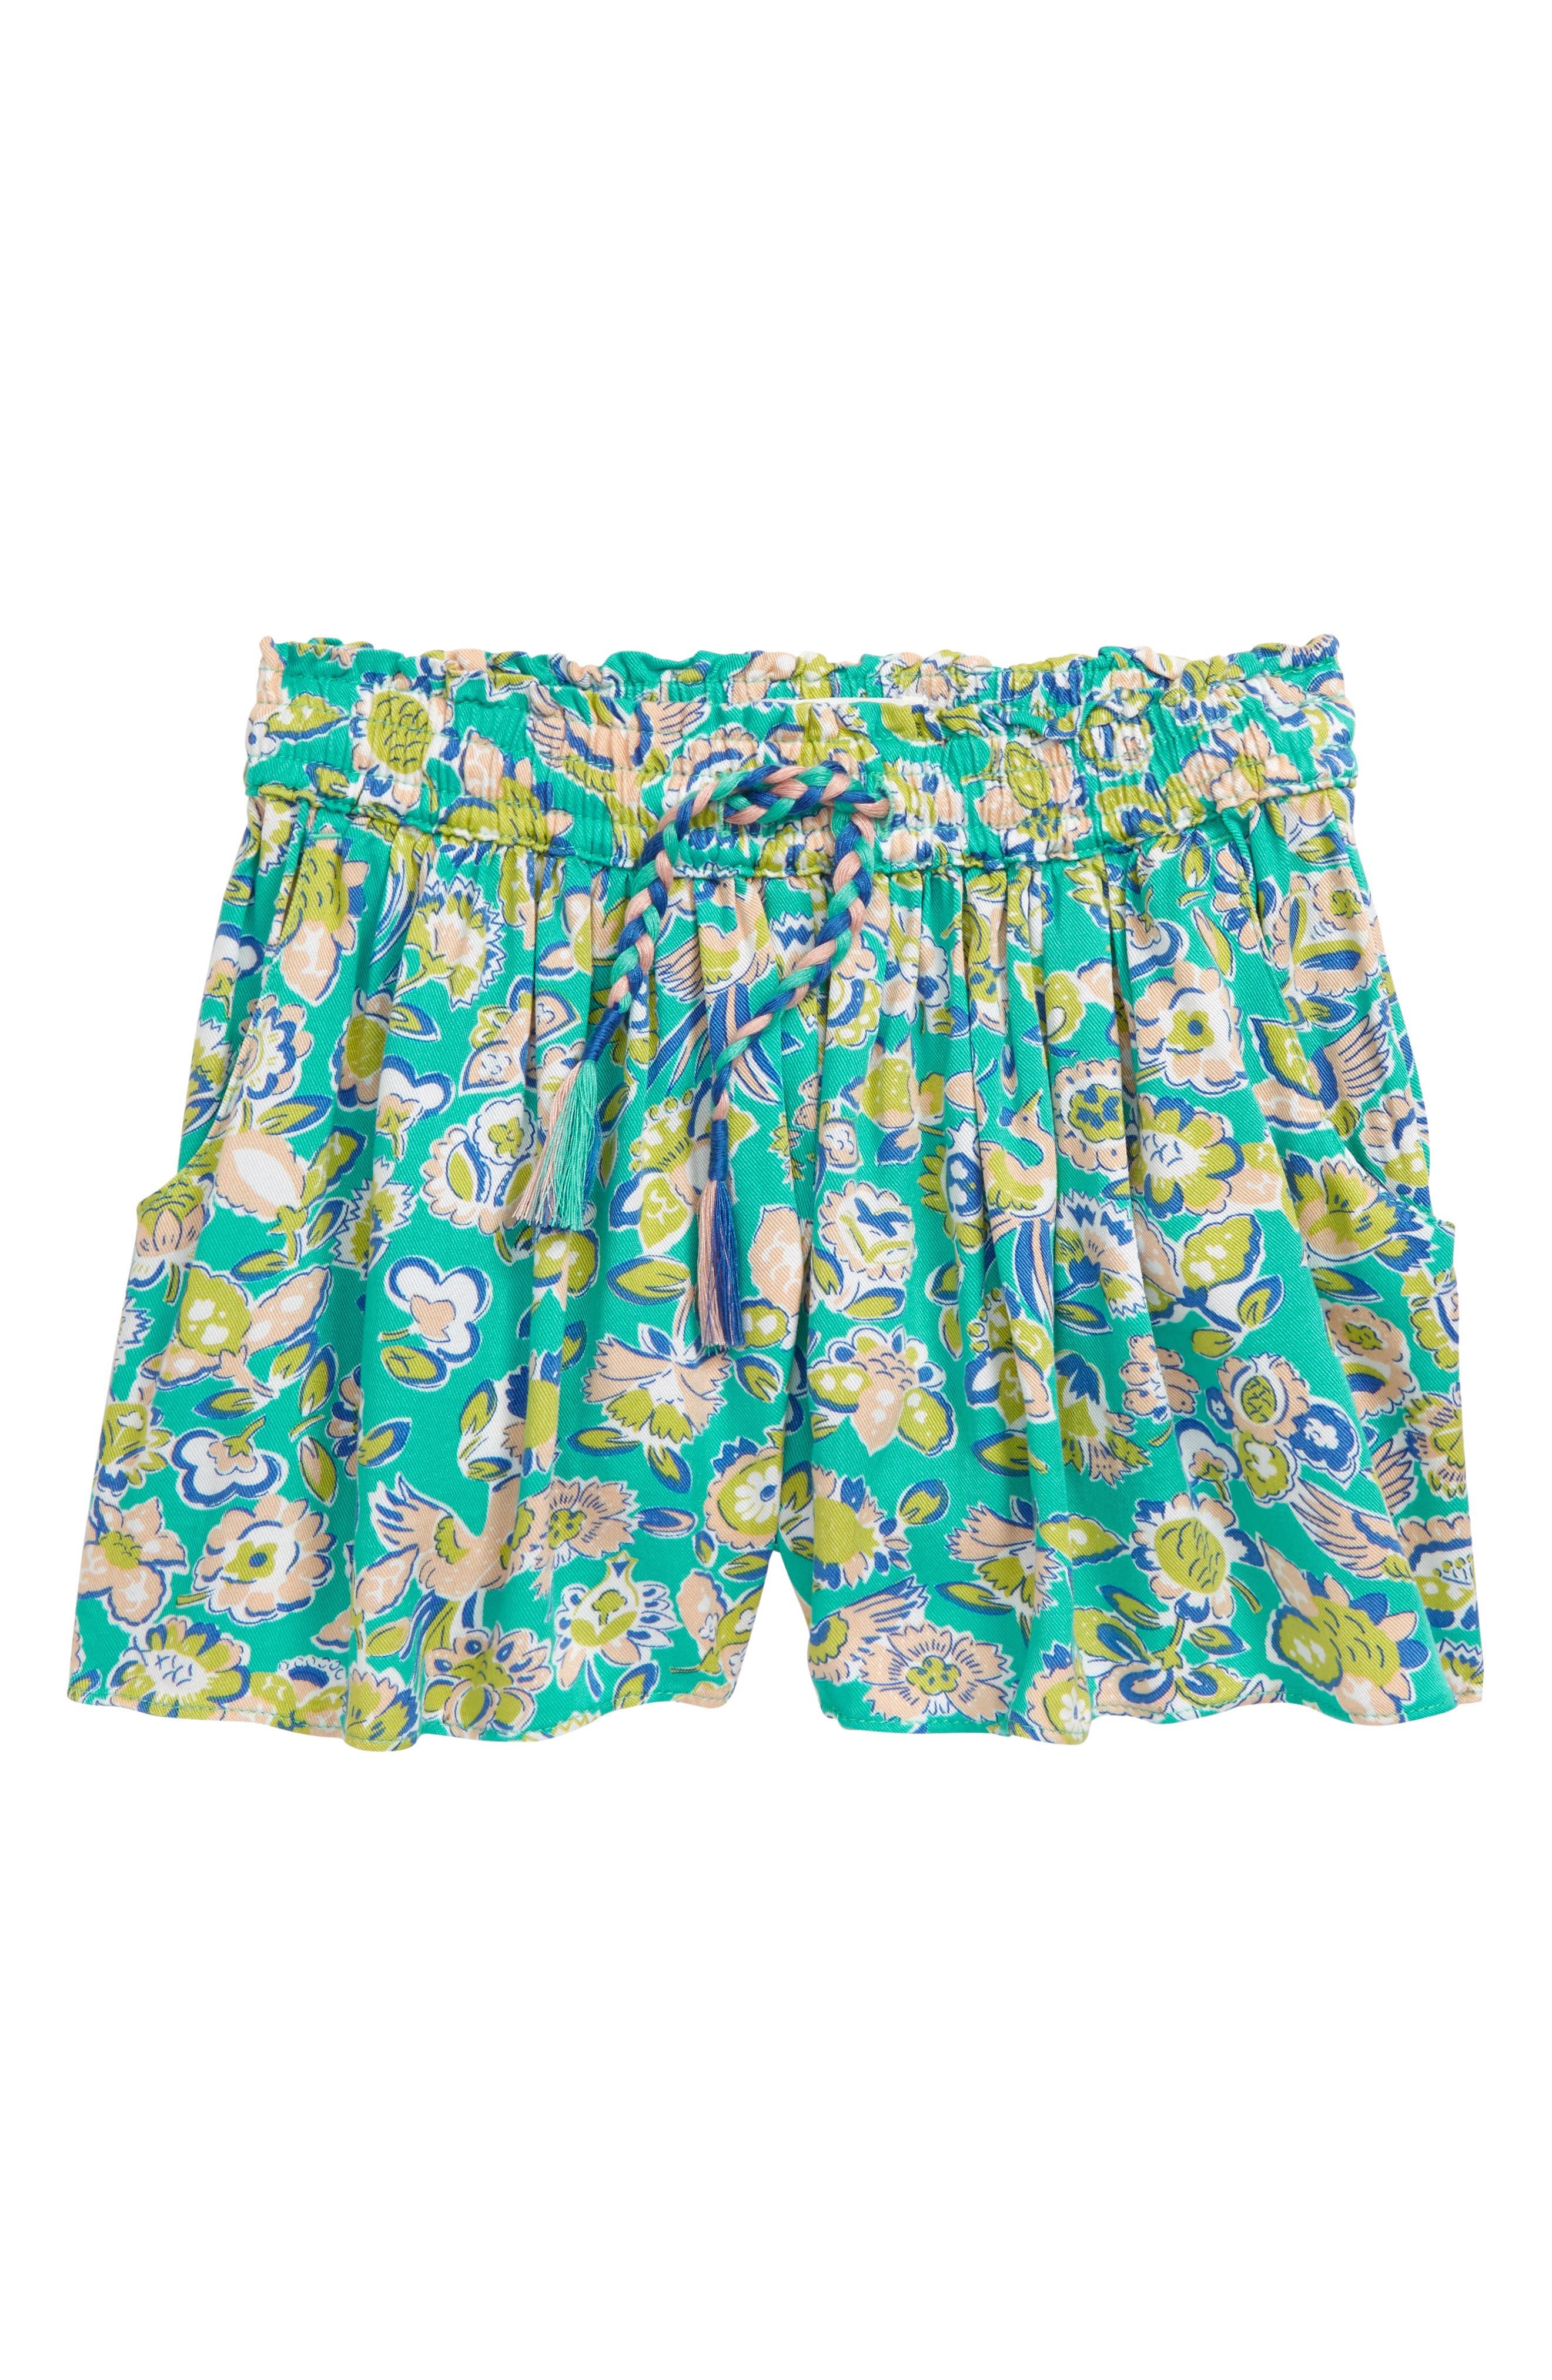 Toddler Girls Mini Boden Pretty Print Shorts Size 23Y  Blue